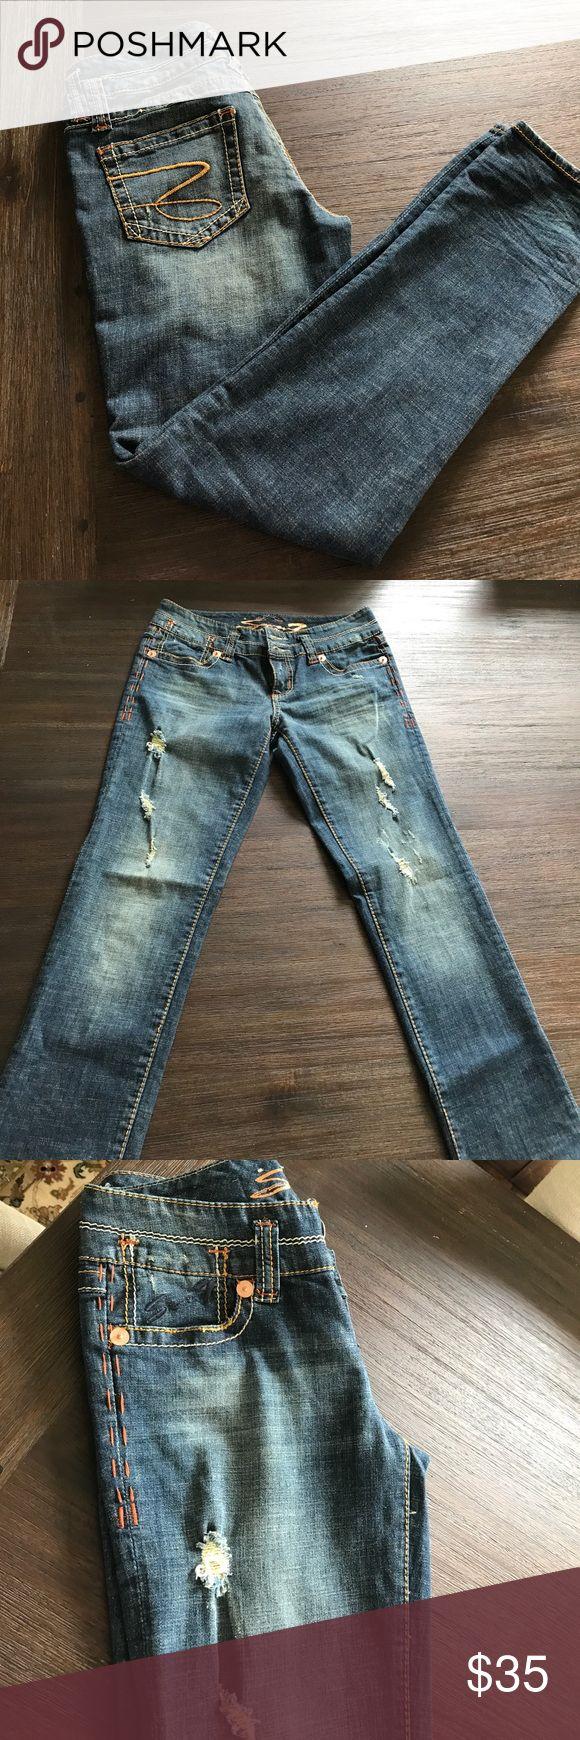 On sale Seven 7 slim straight jean Seven 7 slim straight jean, new without tags Seven7 Jeans Straight Leg